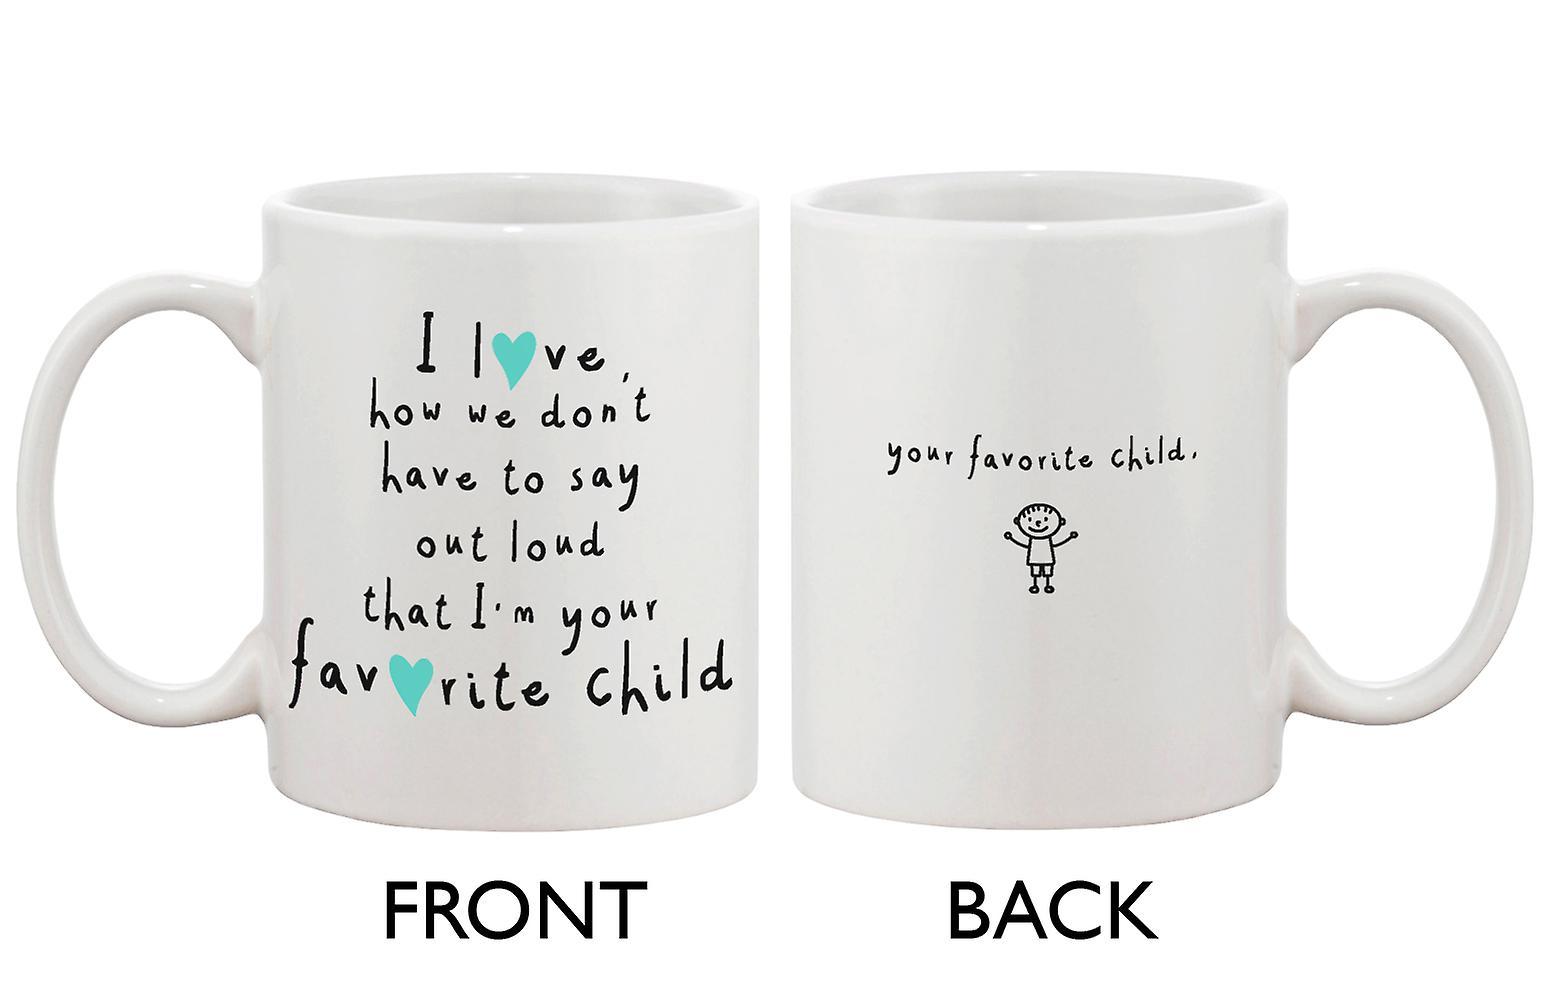 Cute Ceramic Coffee Mug for Mom from